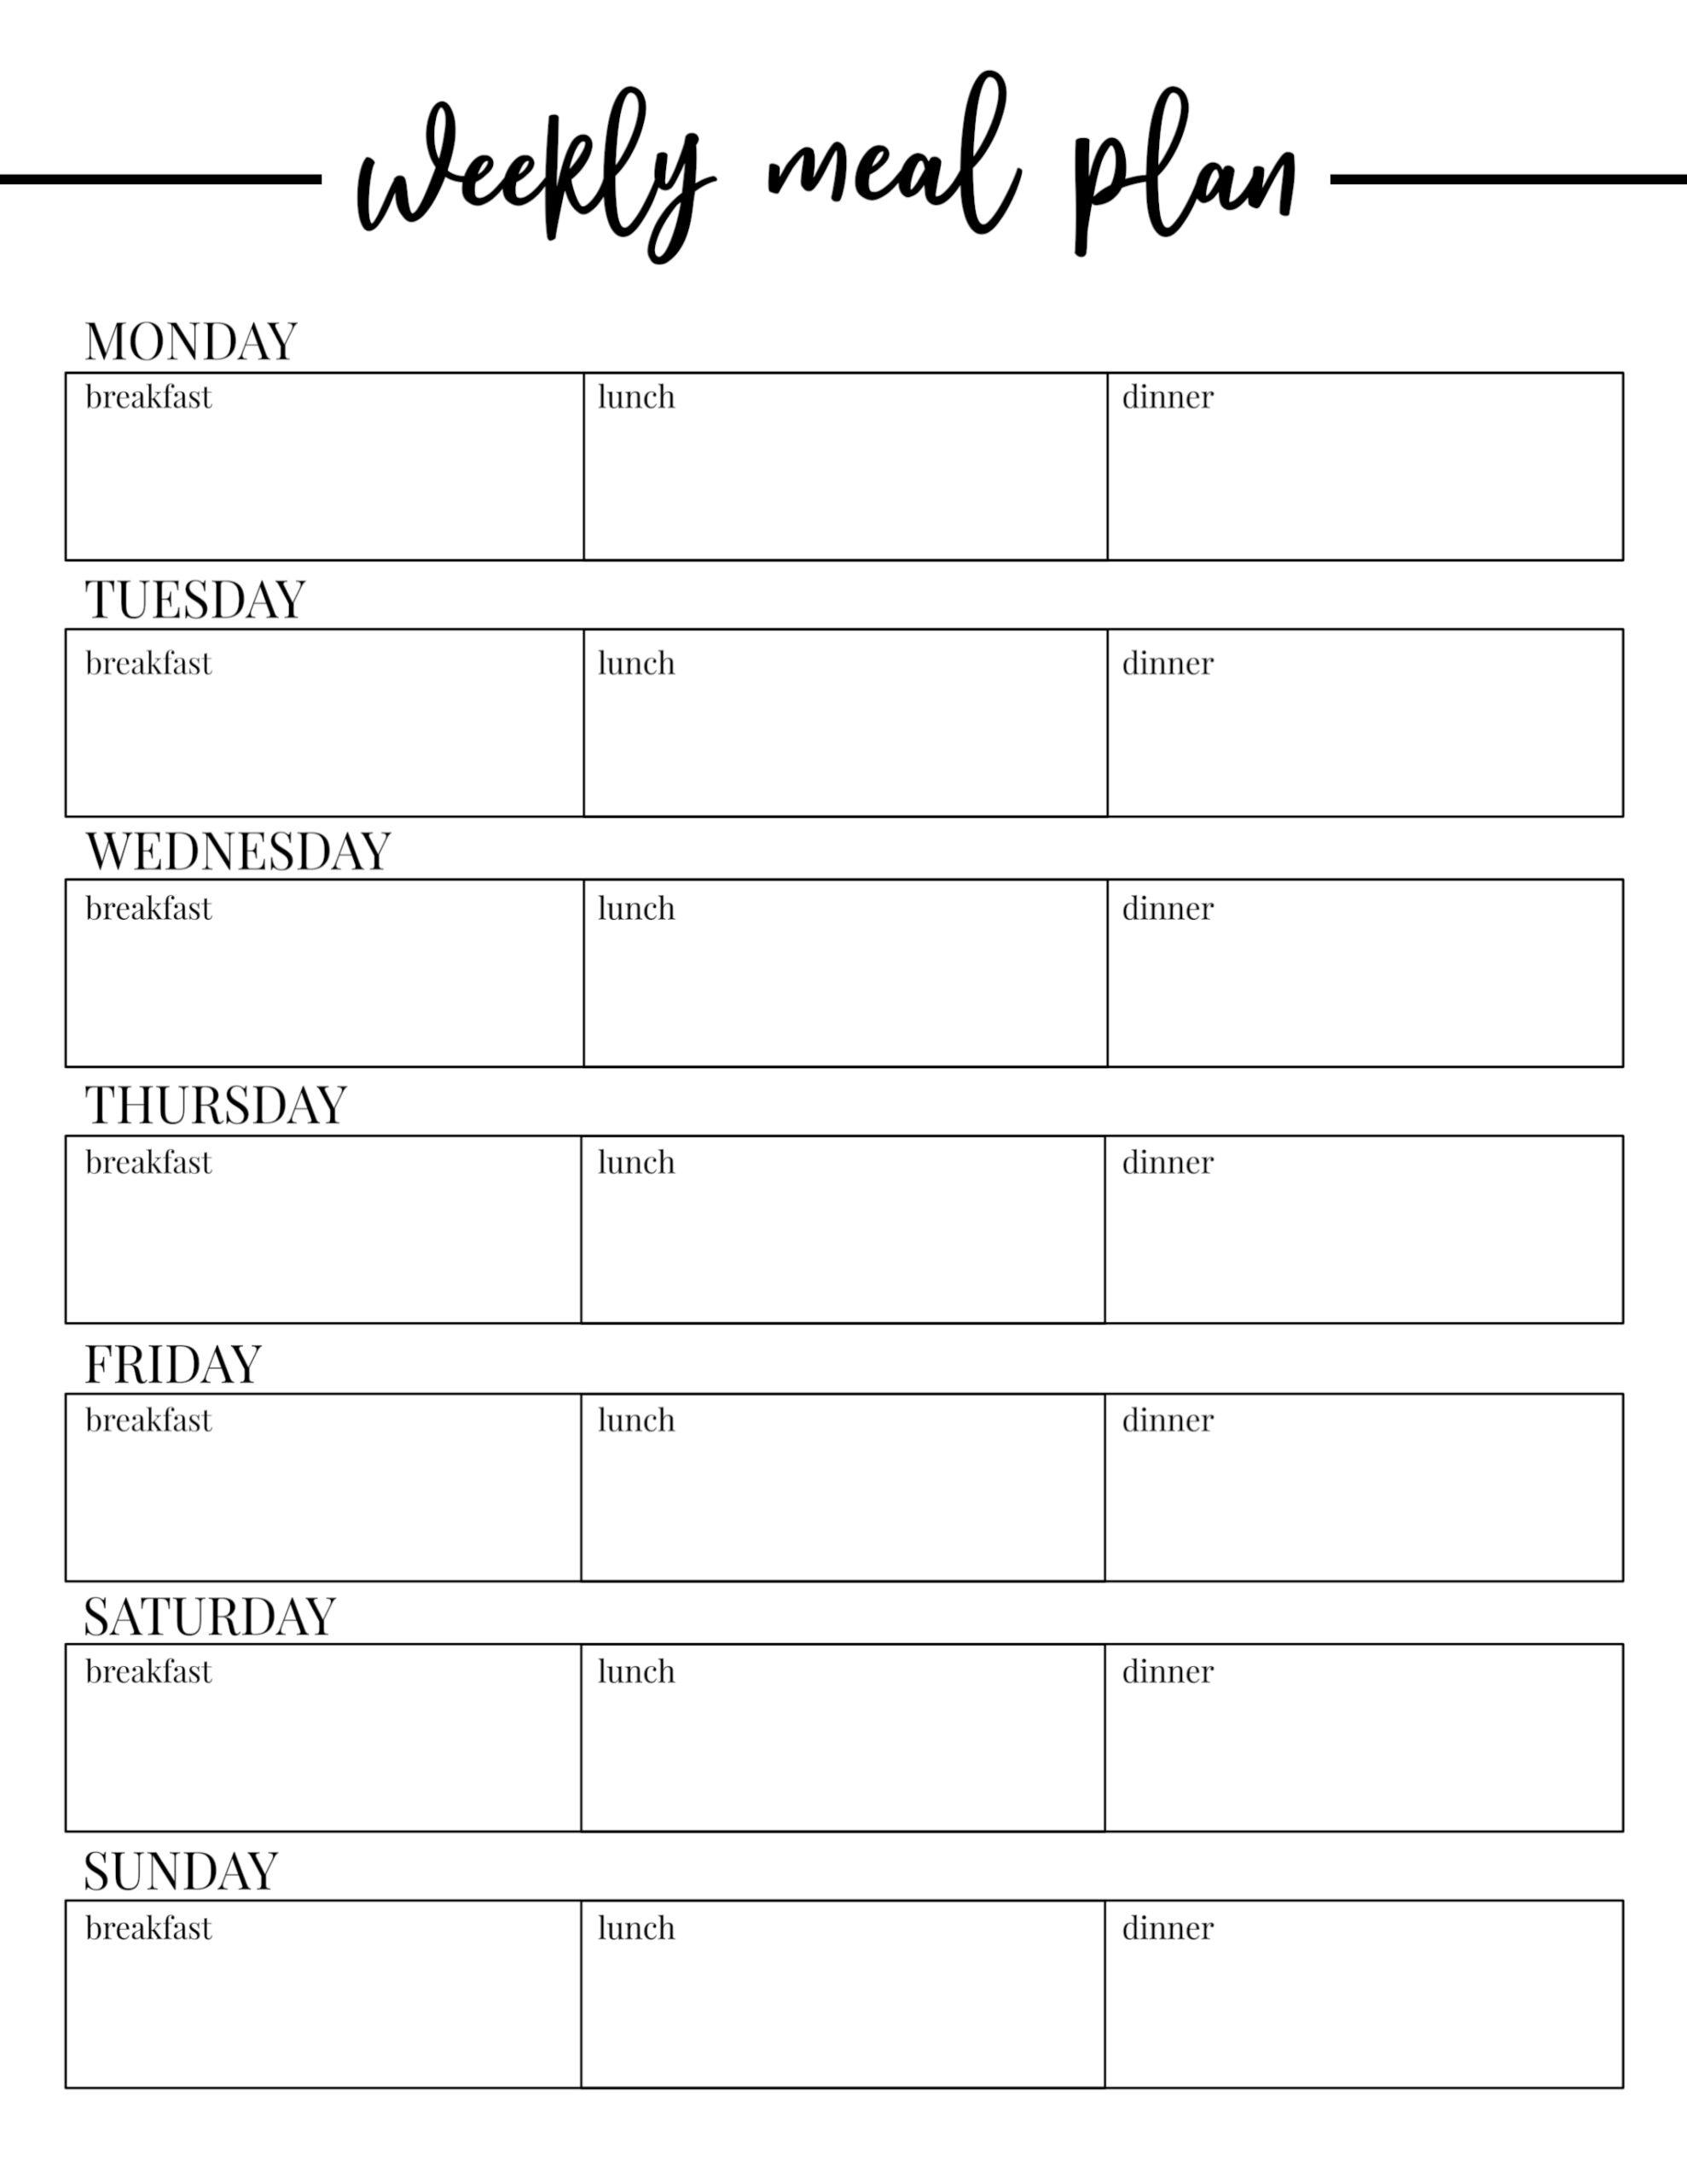 Free Printable Weekly Meal Plan Template   Paper Trail Design inside Free Printable Monthly Menu Calendar